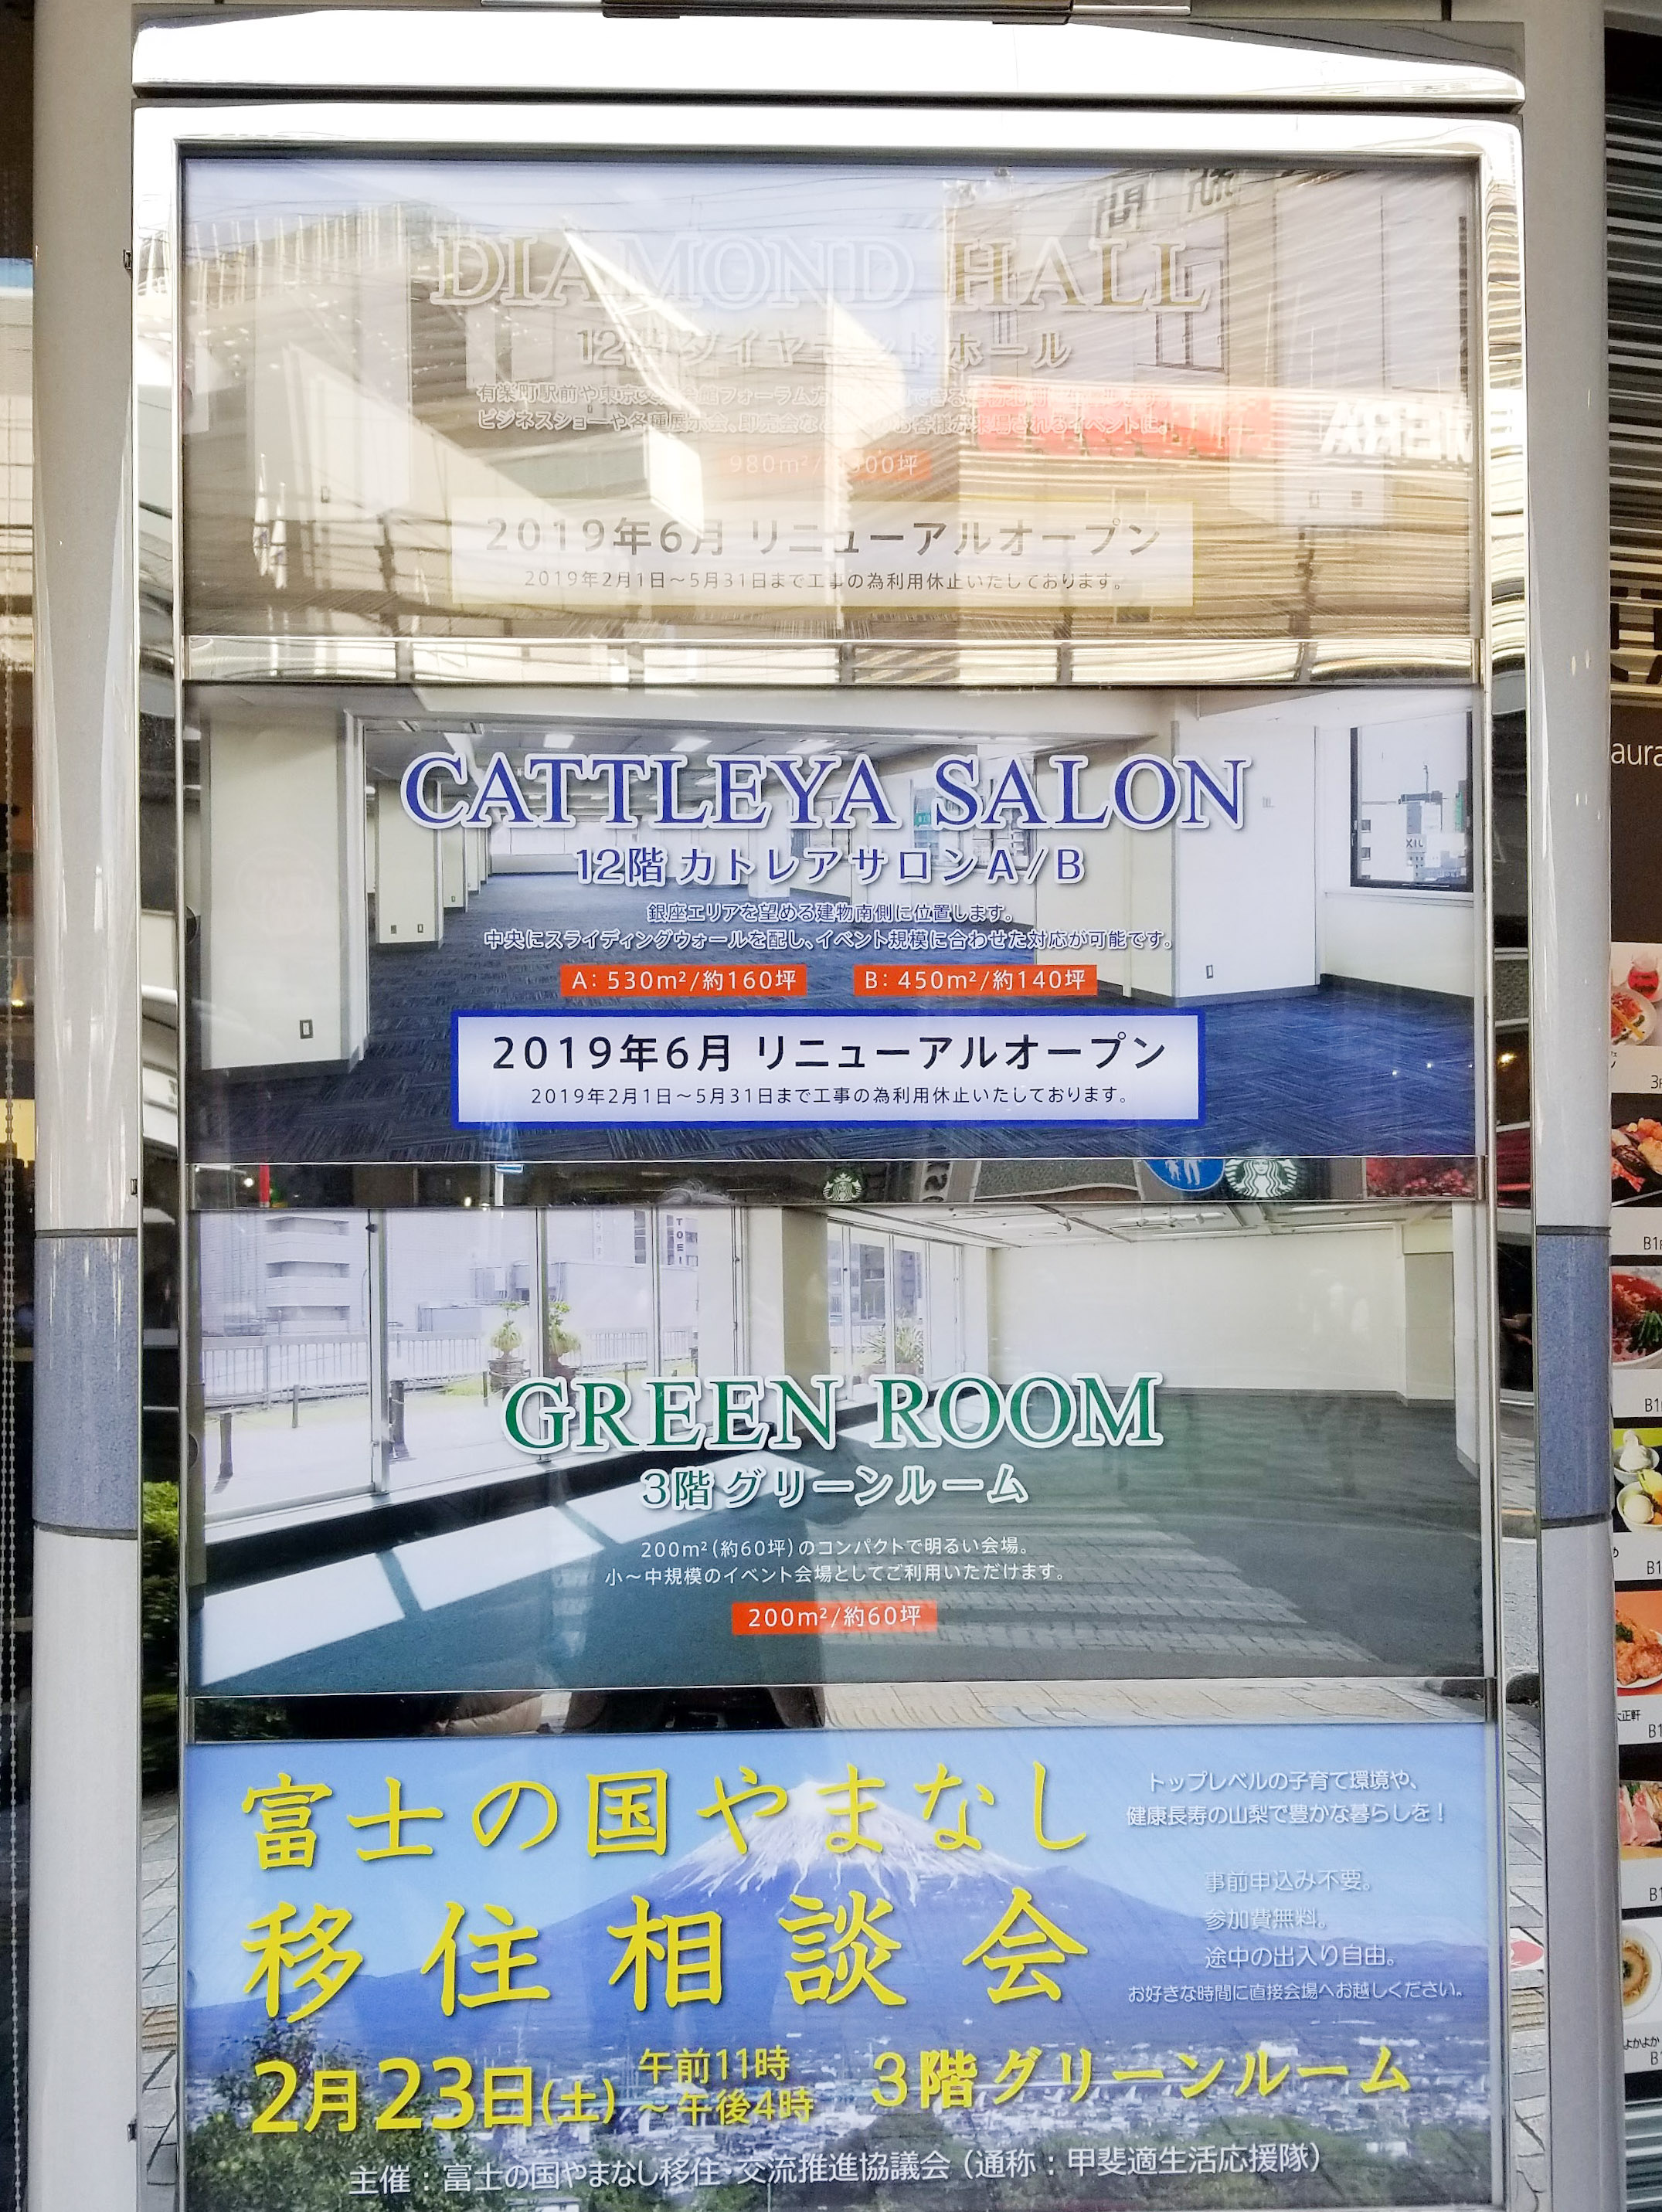 https://www.resortlife.jp/pickup/PSX_20190228_155628.jpg